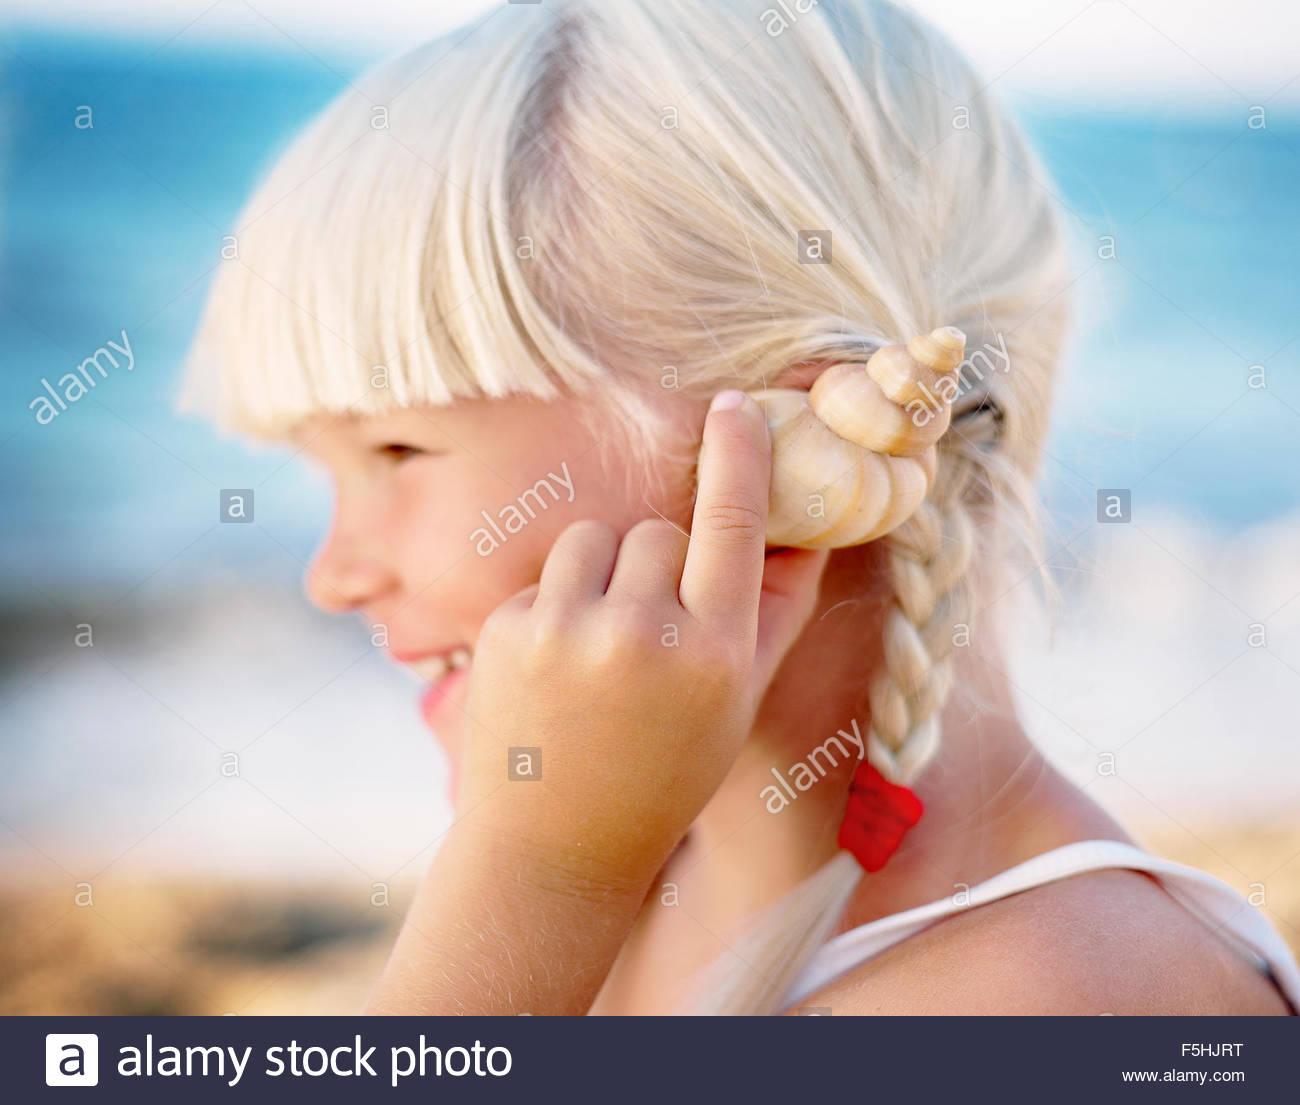 Greece, Crete, Girl (6-7) holding seashell close to ear - Stock Image